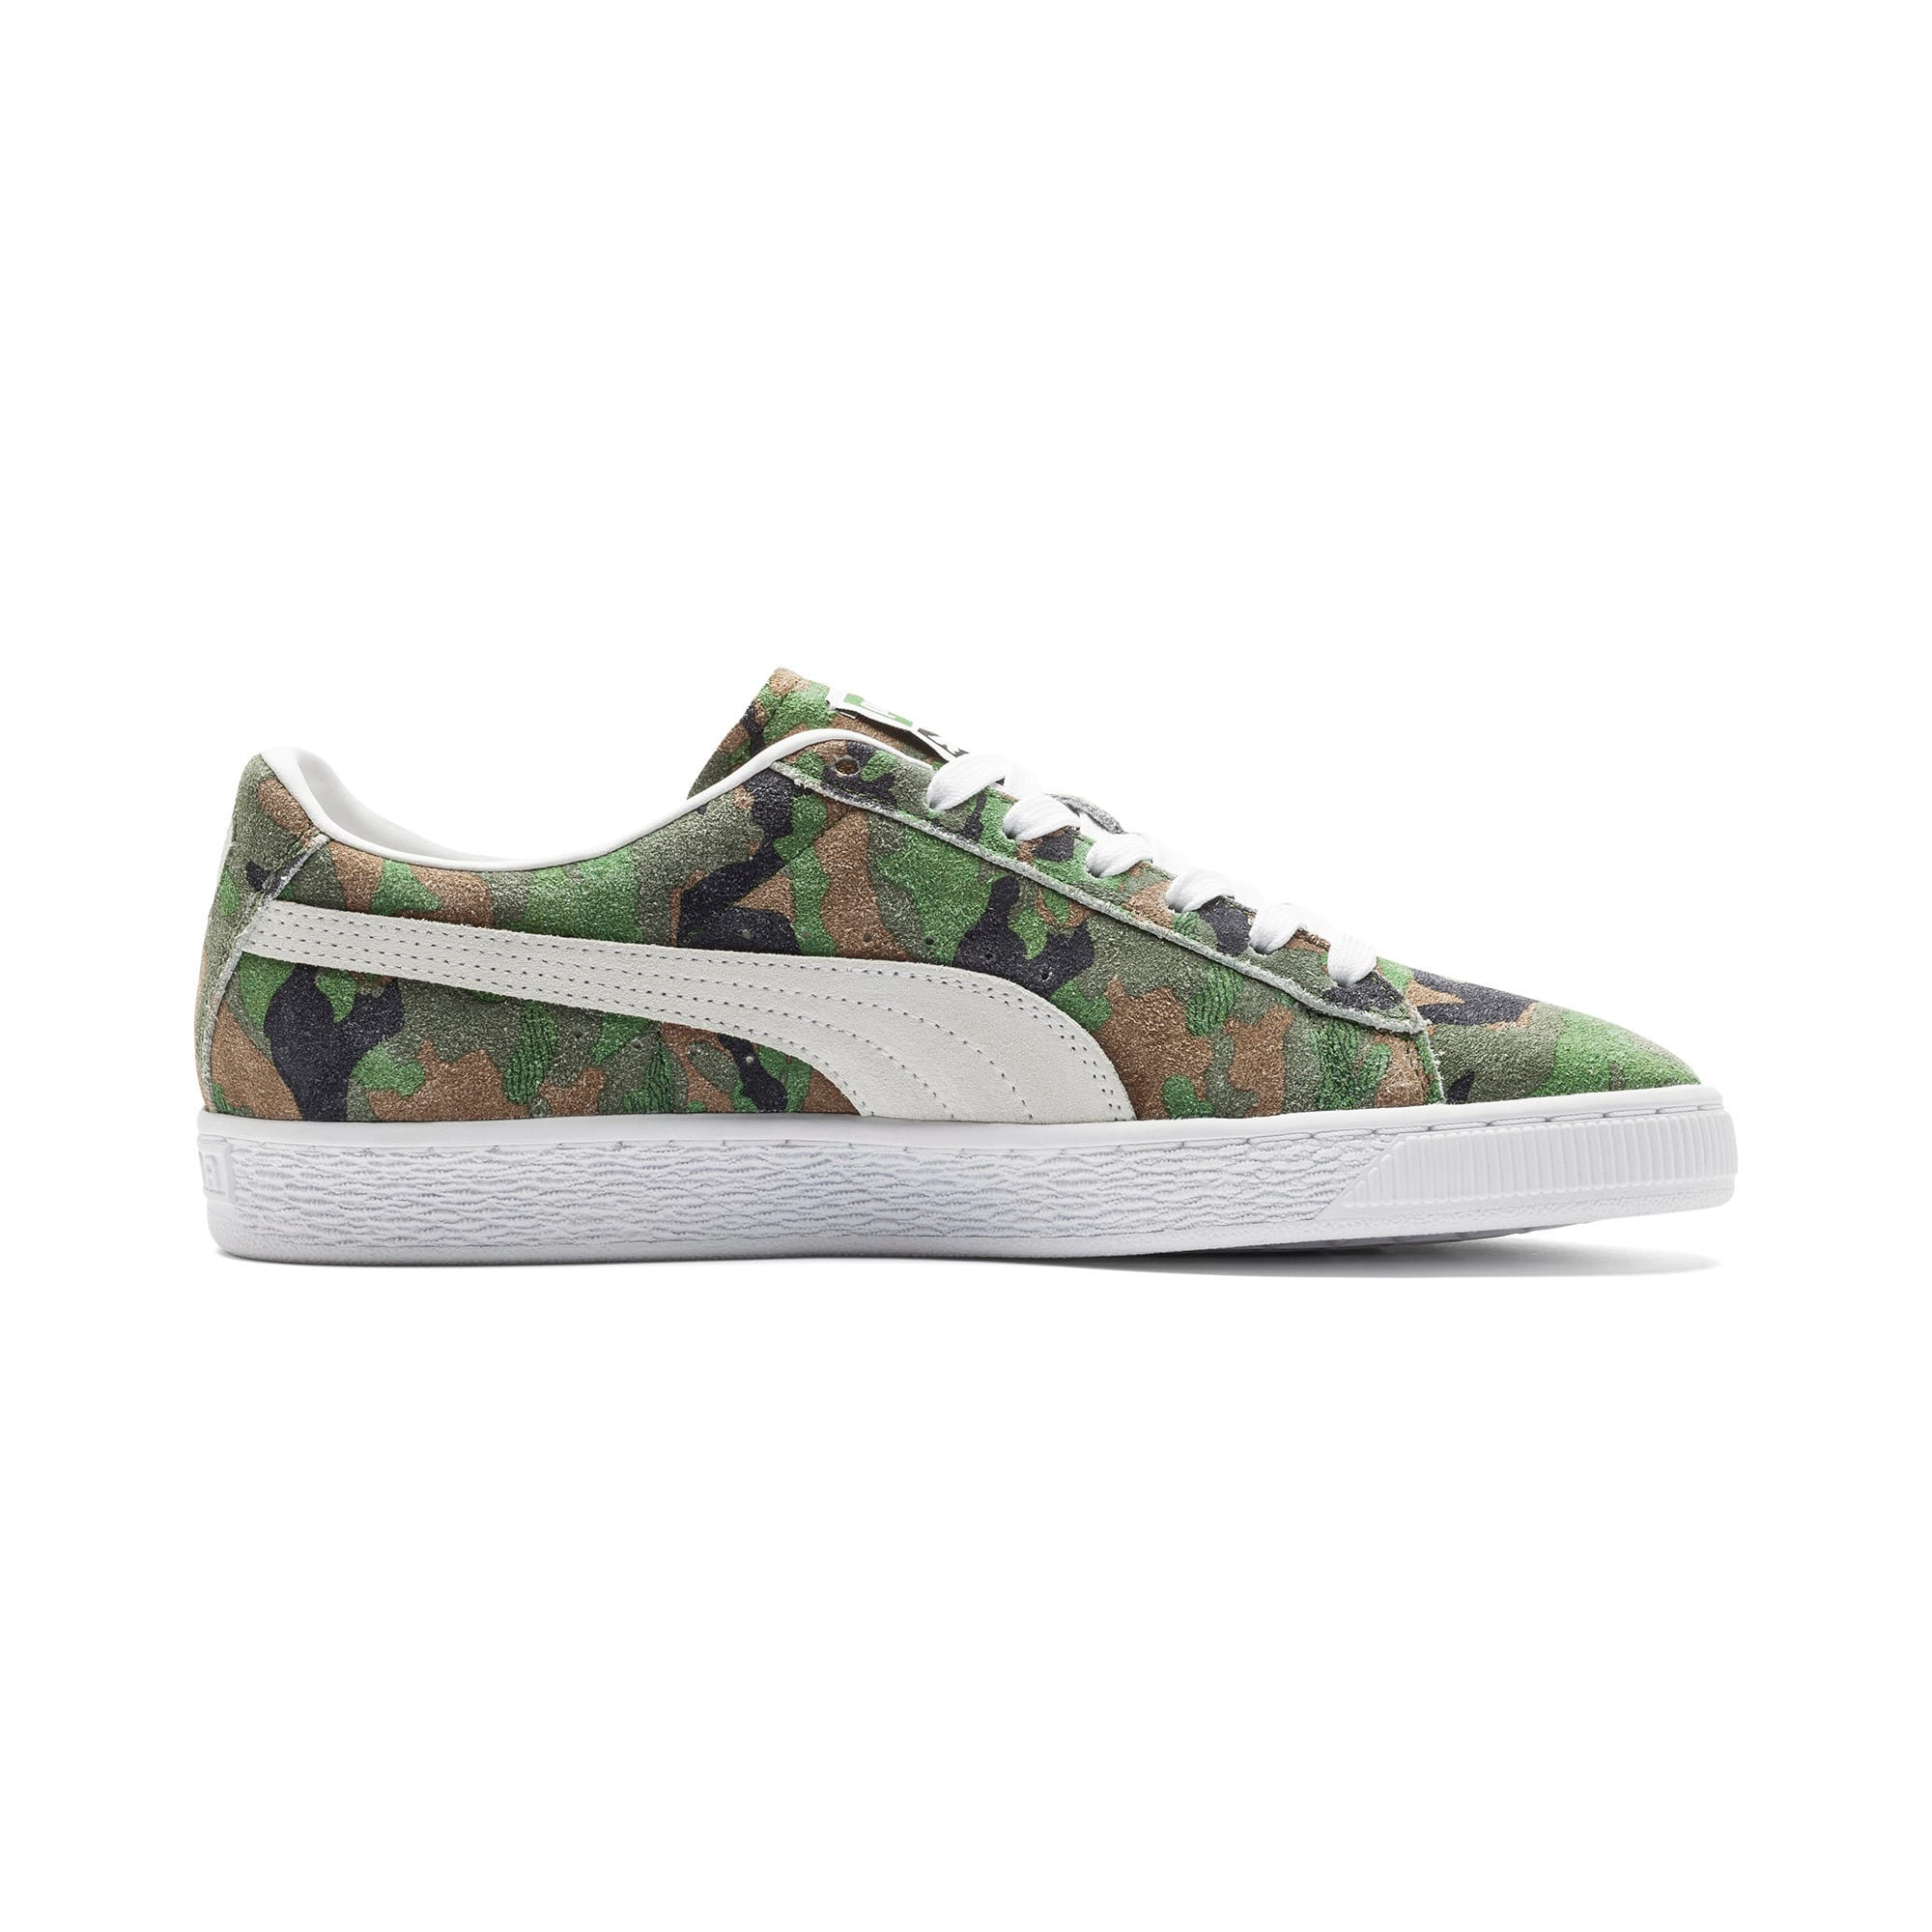 Thumbnail 5 of Suede Classic Ambush Sneakers, Dachsund-Green-Black-White, medium